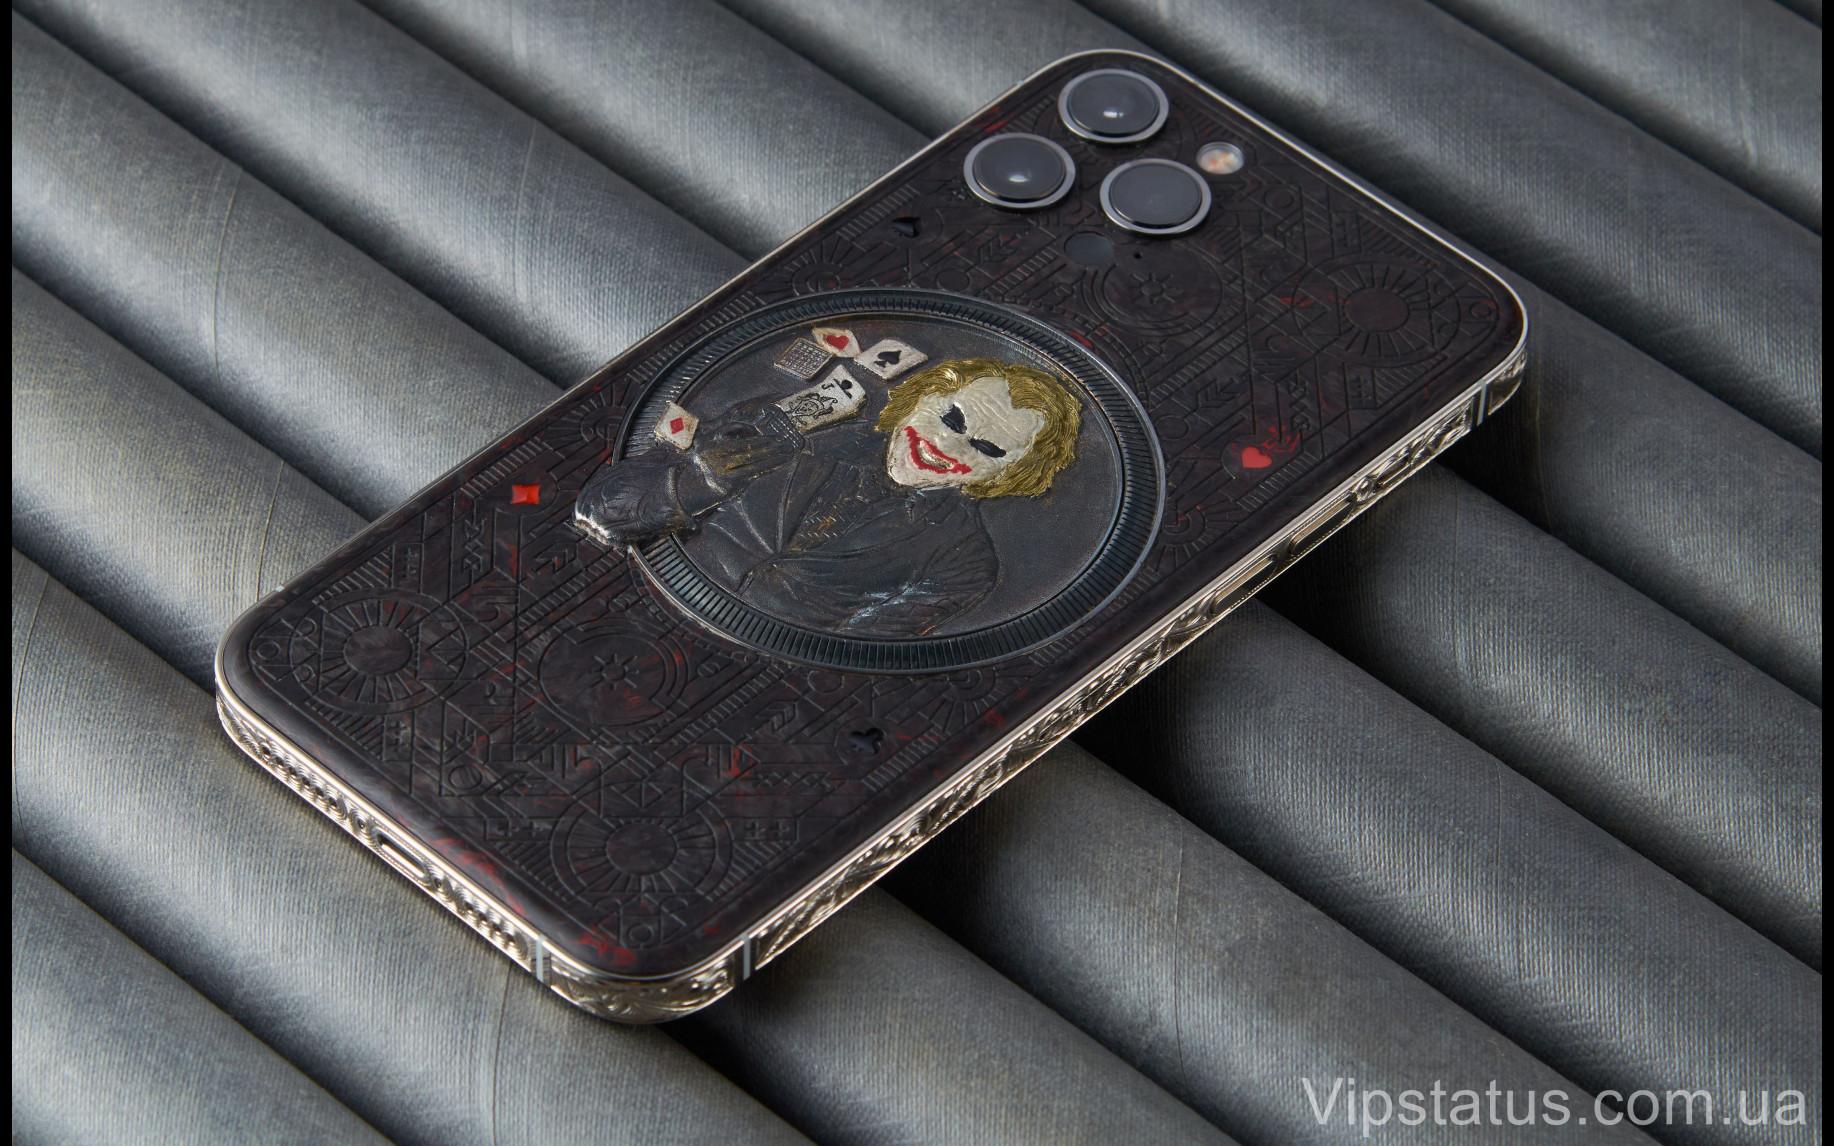 Elite Dark Joker IPHONE 13 PRO MAX 512 GB Dark Joker IPHONE 13 PRO MAX 512 GB image 6